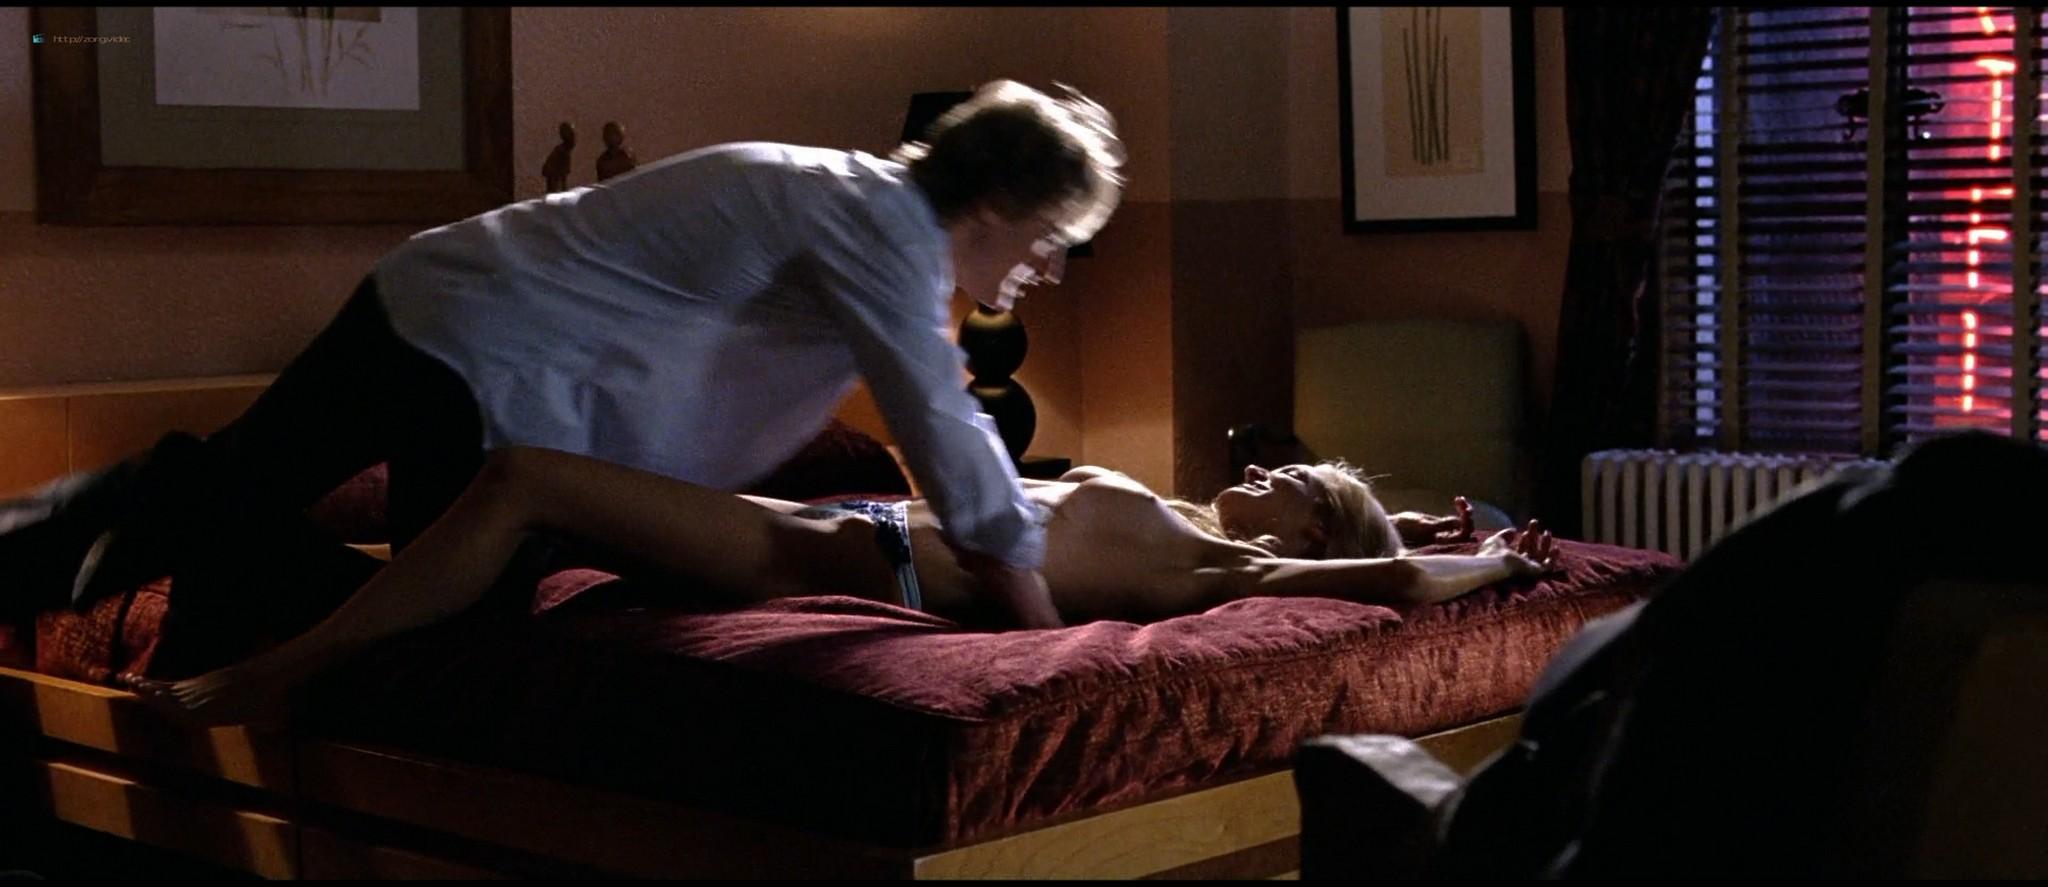 Diora Baird nude topless huge boobs others nude too - Wedding Crashers (2005) HD 1080p BluRay (12)